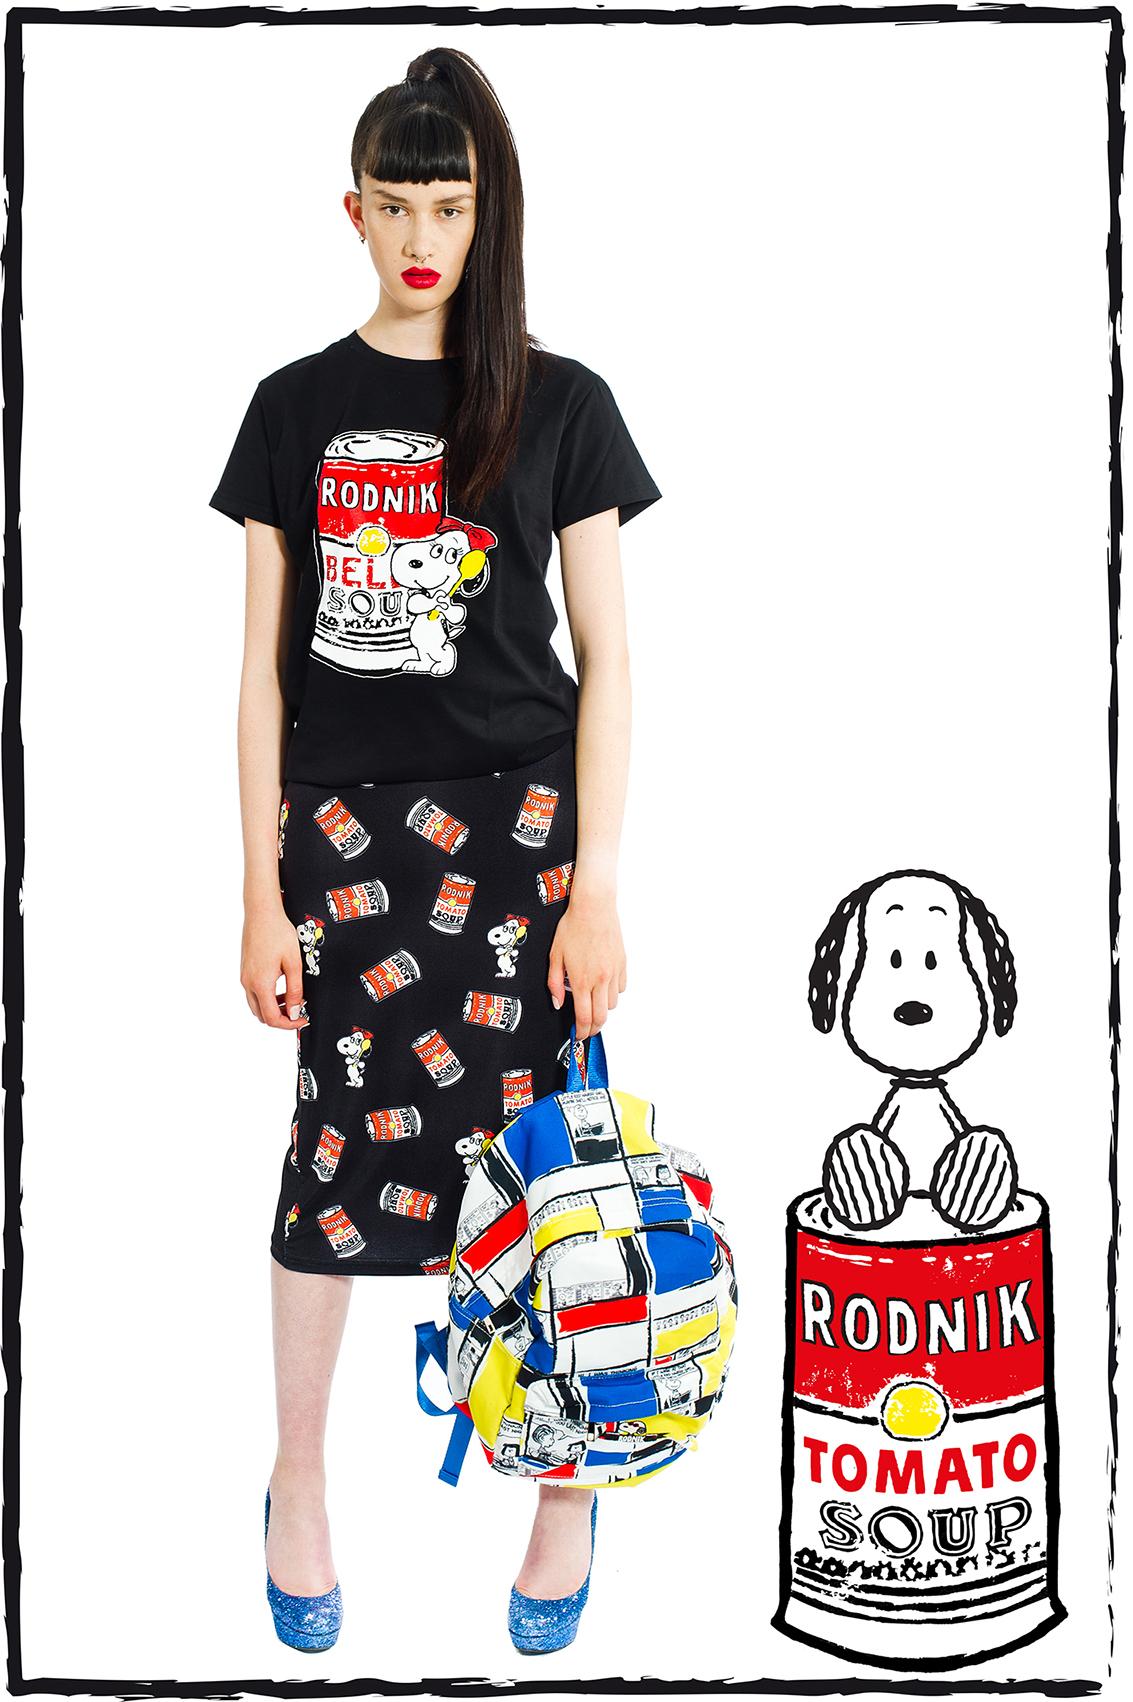 rodnik x peanuts for galeries lafayette (3 of 16)